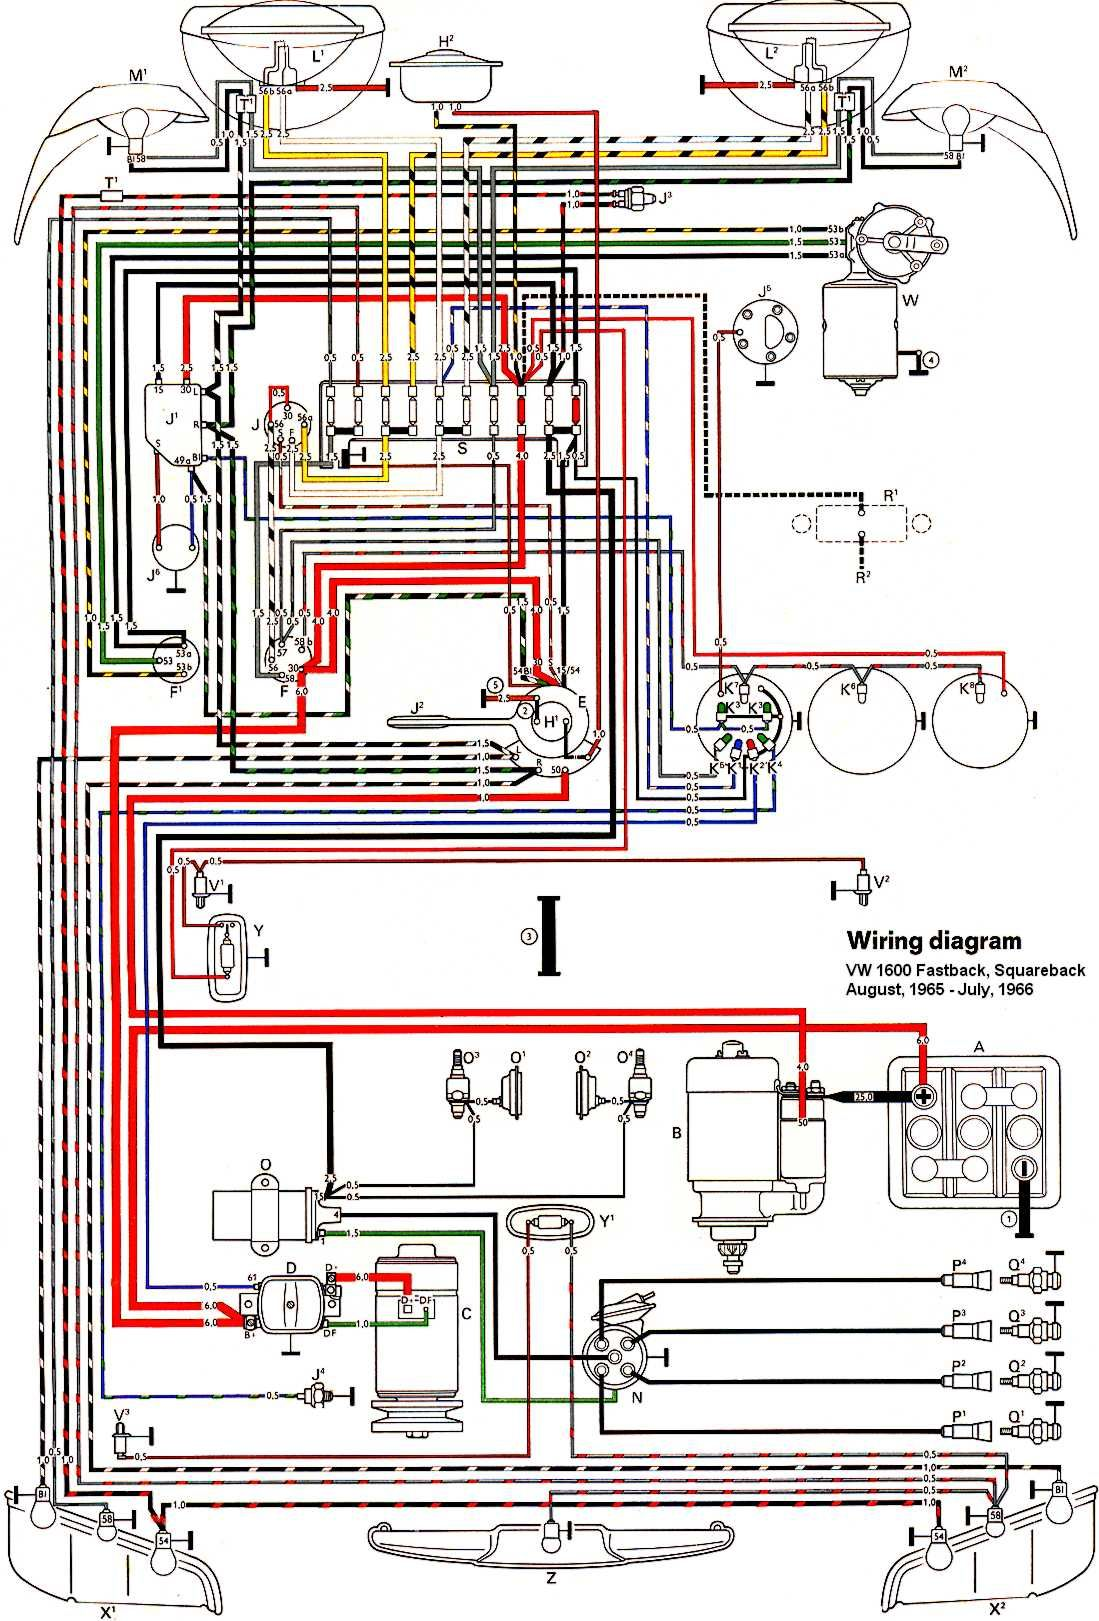 67 Vw Bug Wiring Diagram Diagrams Schematics At 1970 Beetle